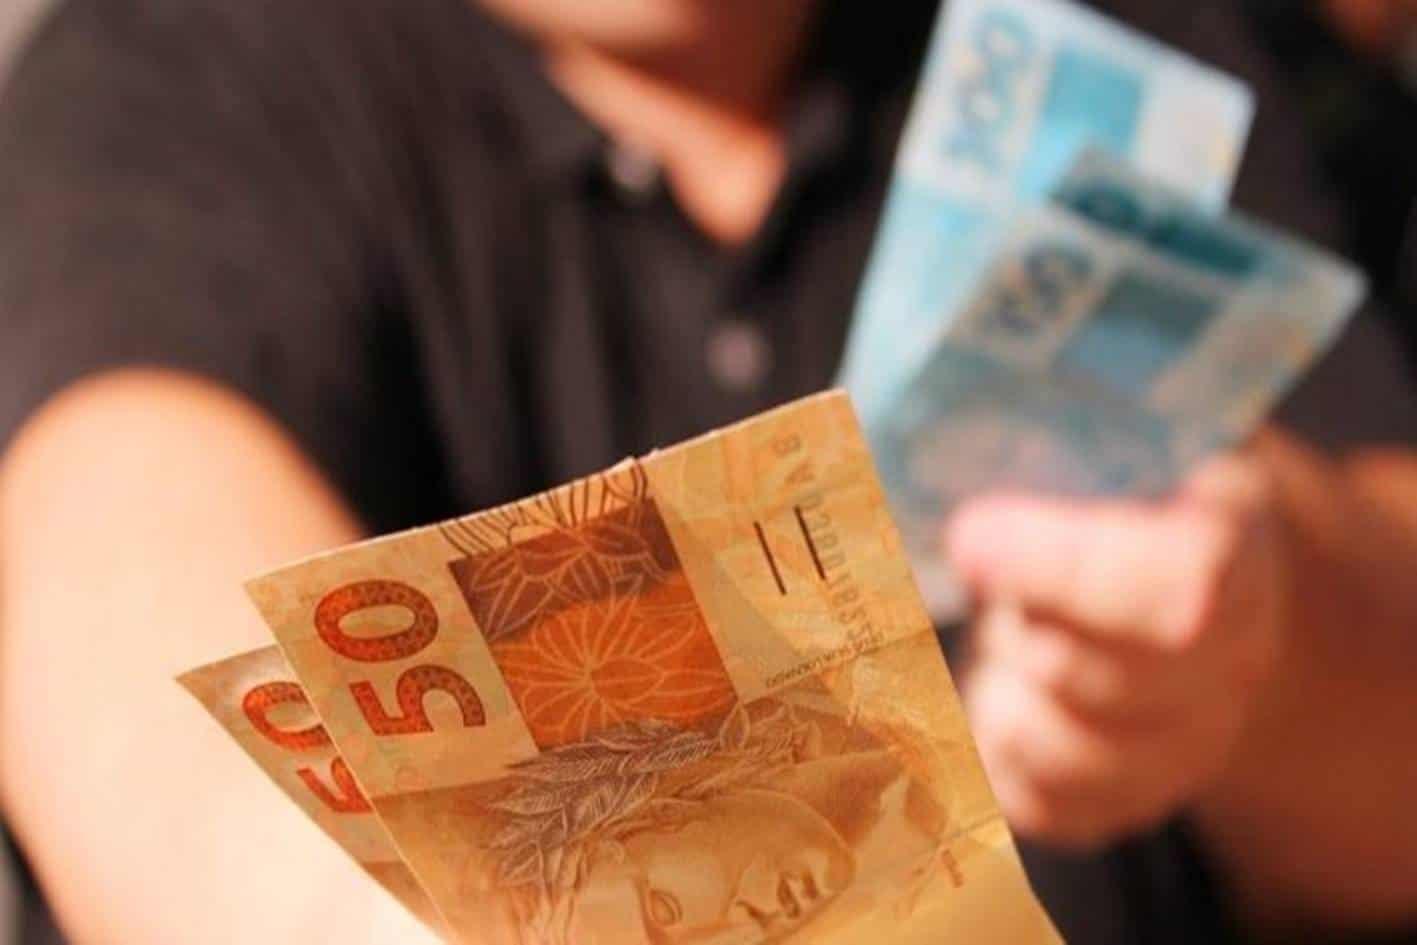 Governo debate novo Saque FGTS de R$ 1.000